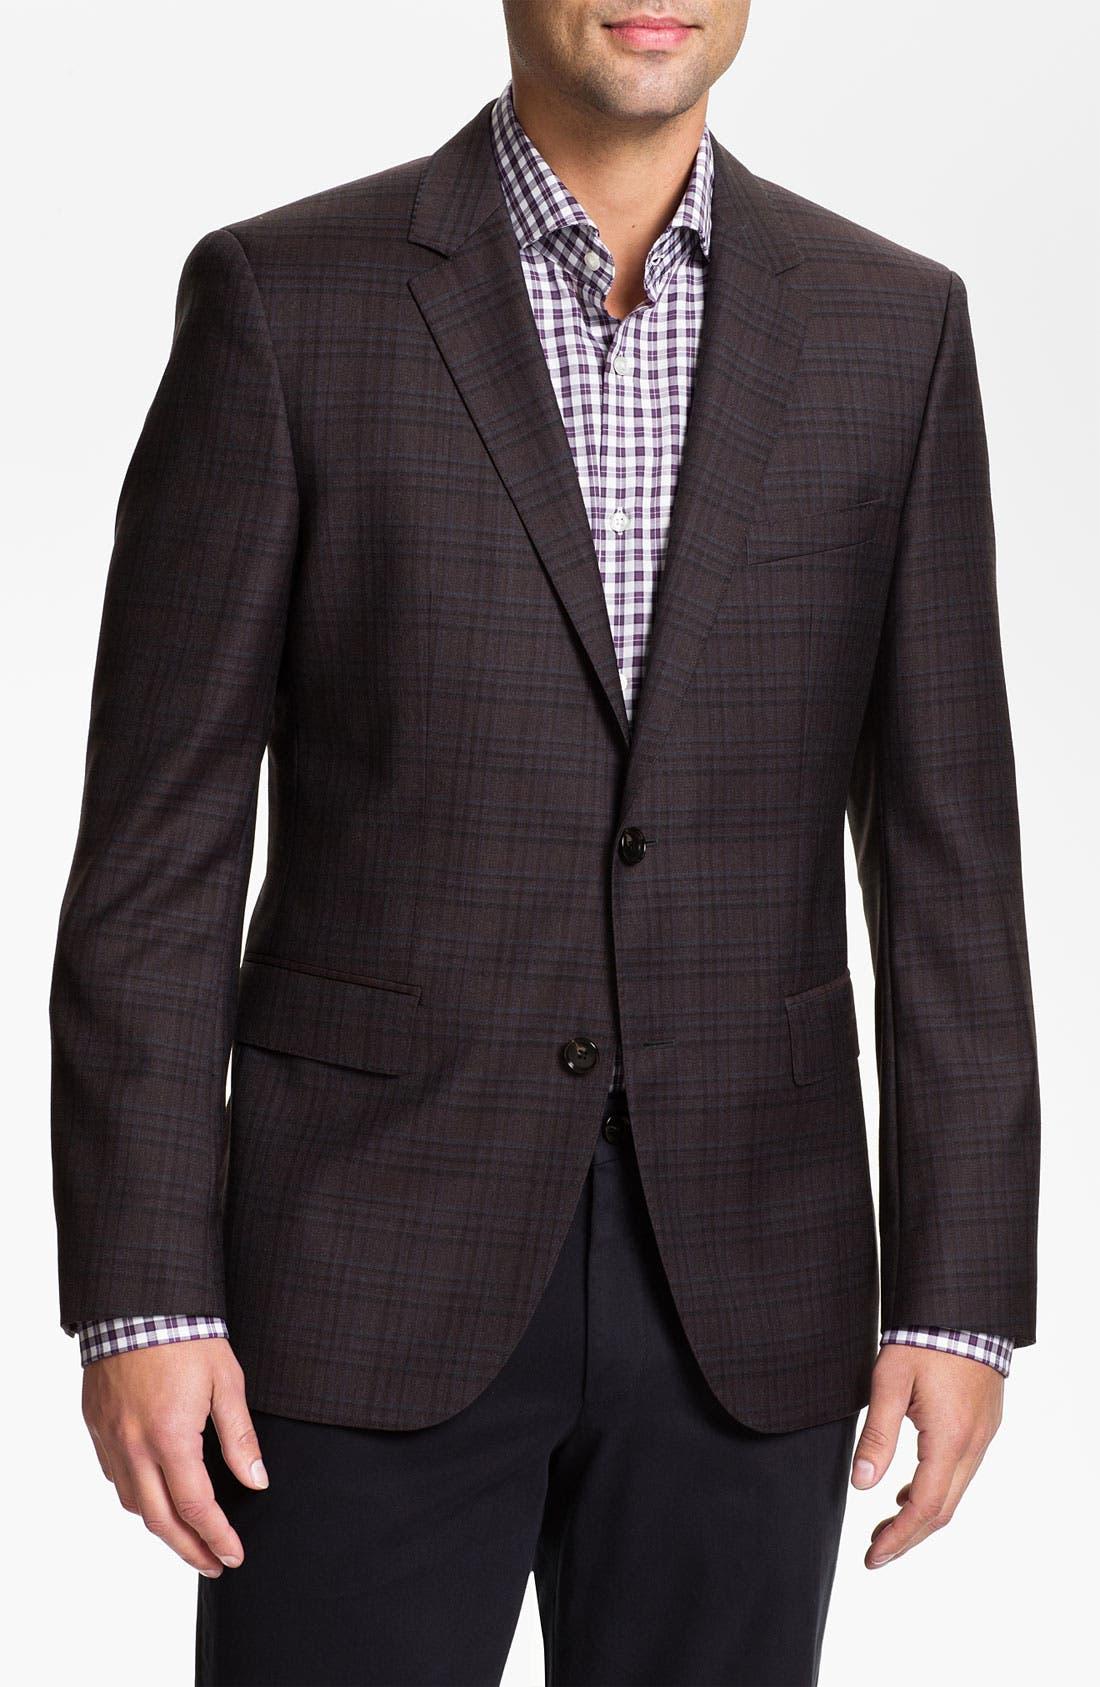 Alternate Image 1 Selected - BOSS Black 'James' Trim Fit Plaid Sportcoat